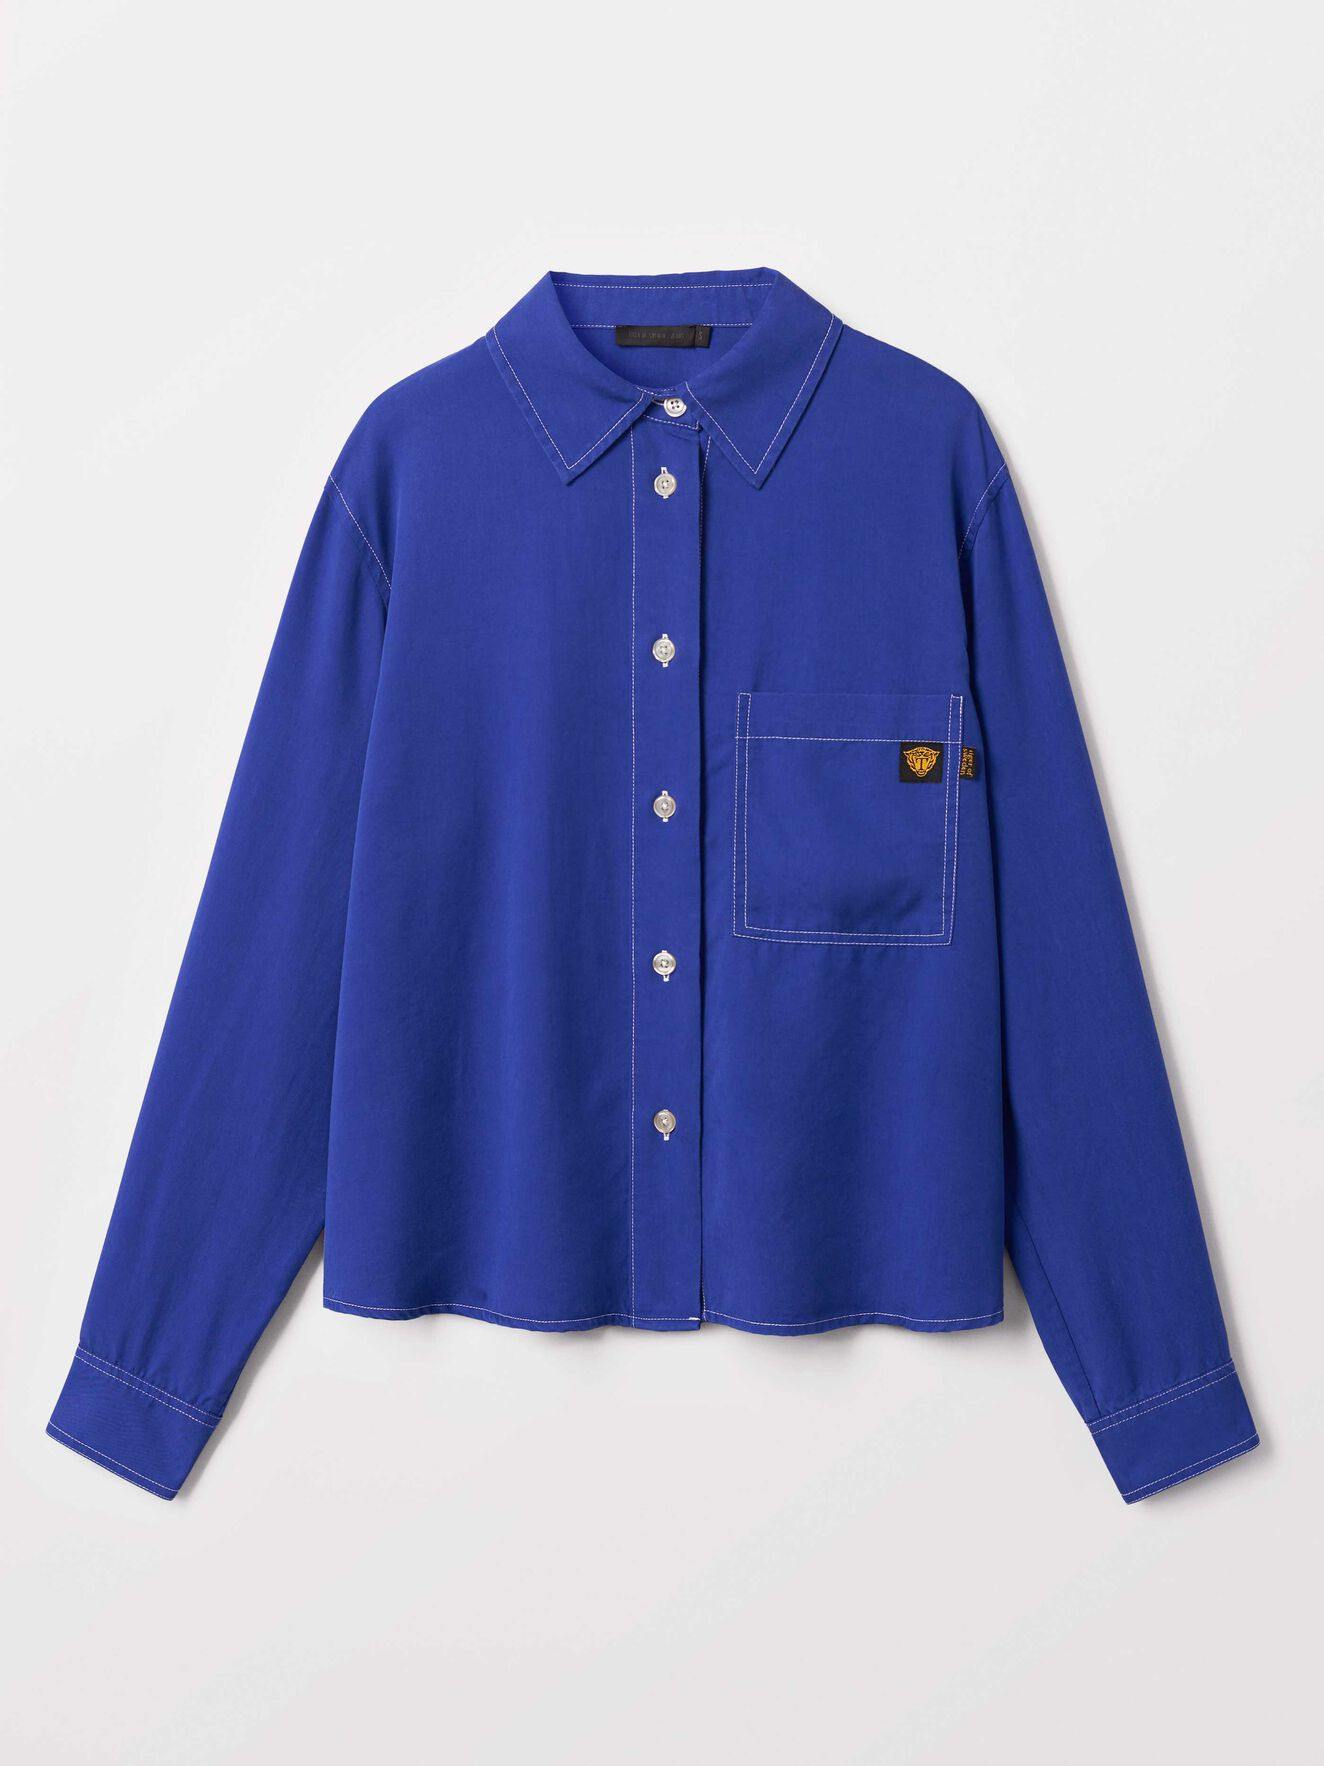 Lee Shirt in Deep Ocean Blue from Tiger of Sweden